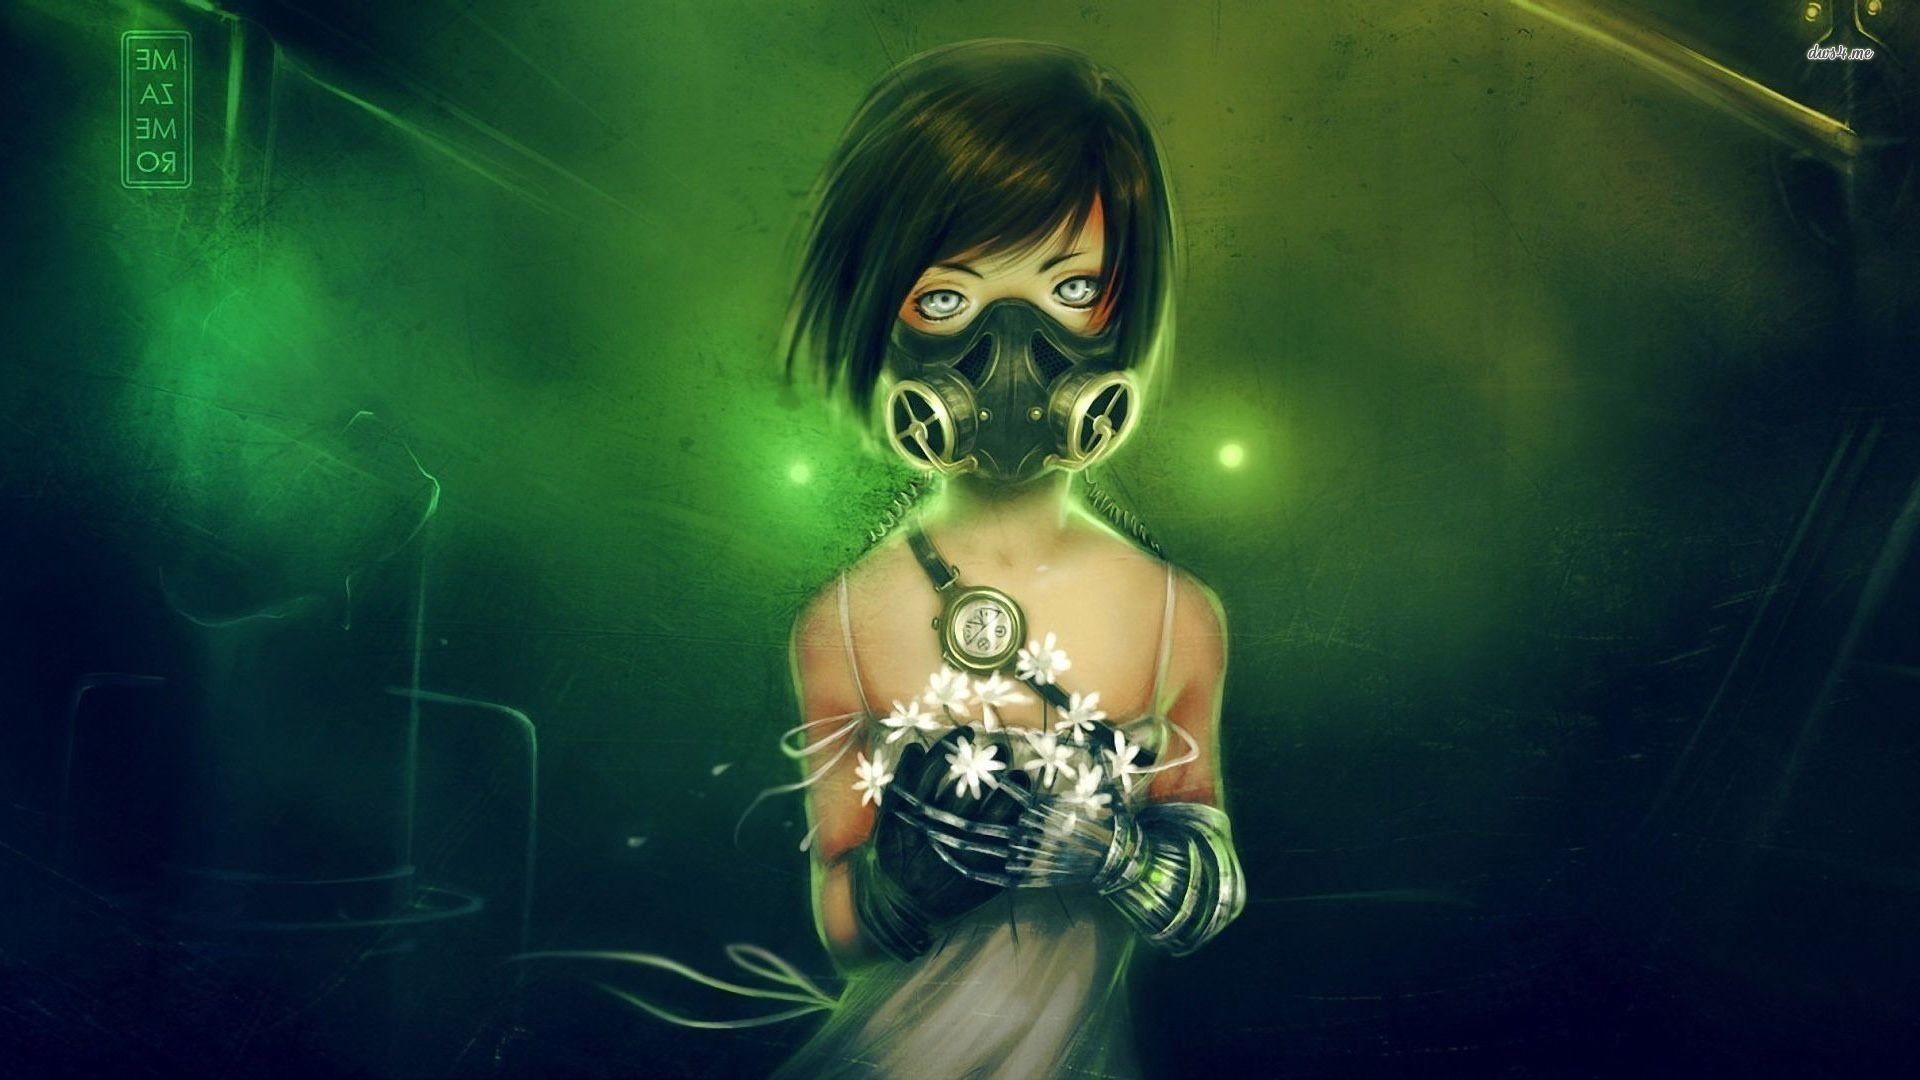 Res: 1920x1080, Toxic girl